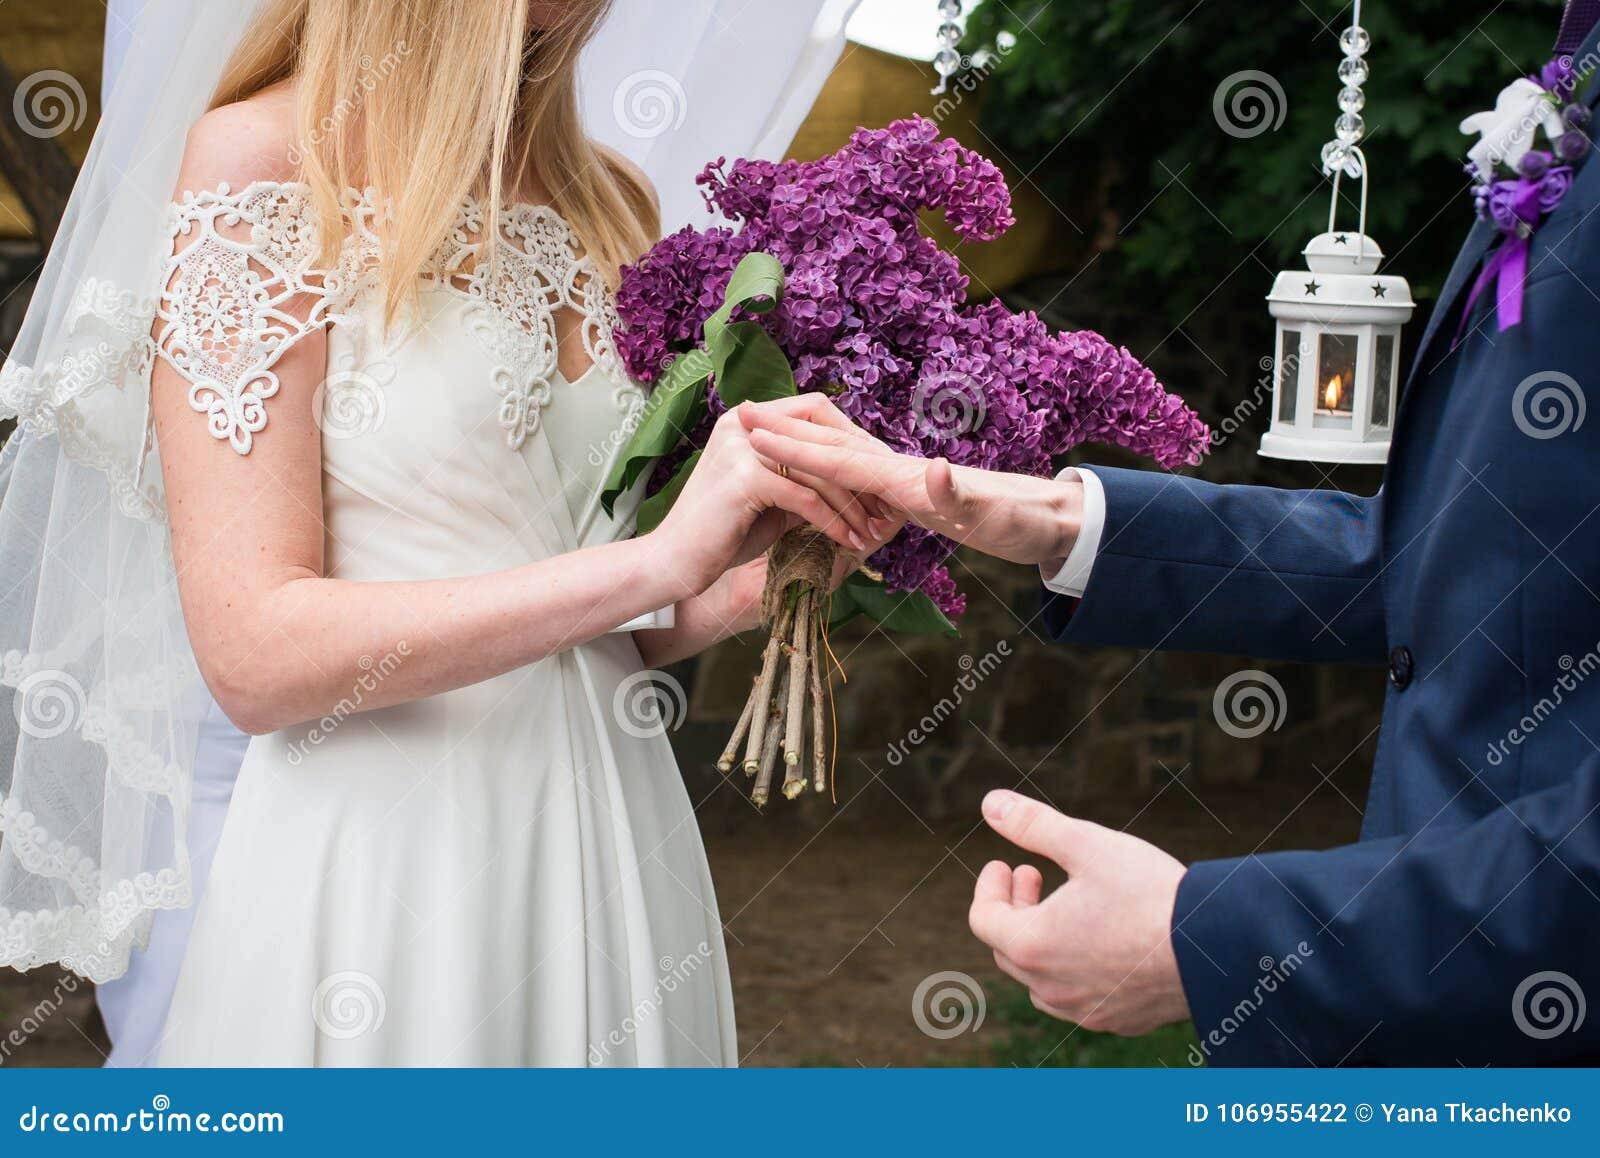 Bride Puts Wedding Ring On Grooms Finger. Bride And Groom Exchange Rings In Wedding Day. Wedding